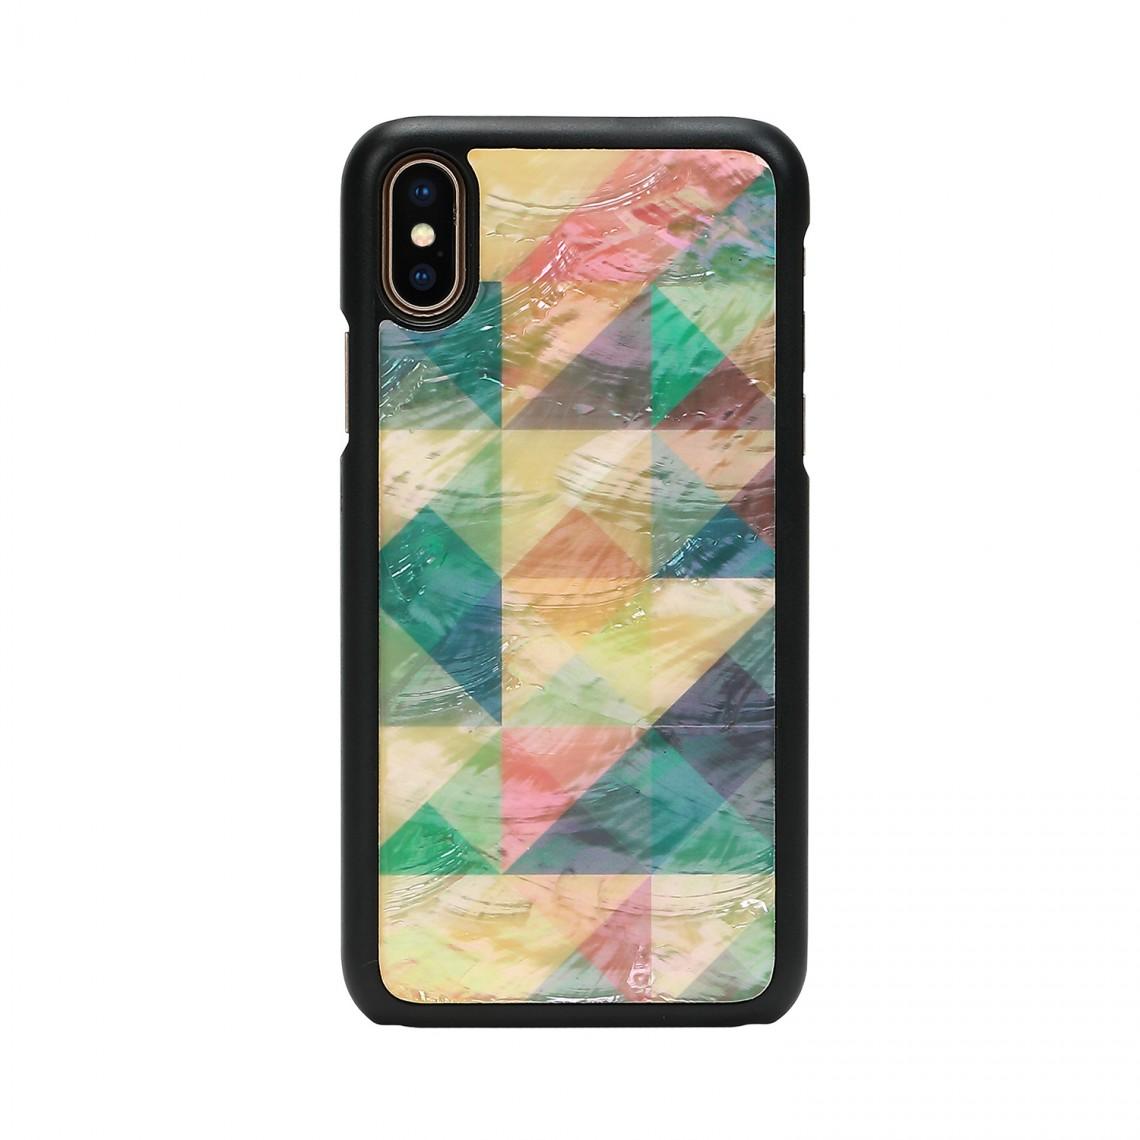 iPhone XR ケース 天然貝 ikins Mosaic(アイキンス モザイク)